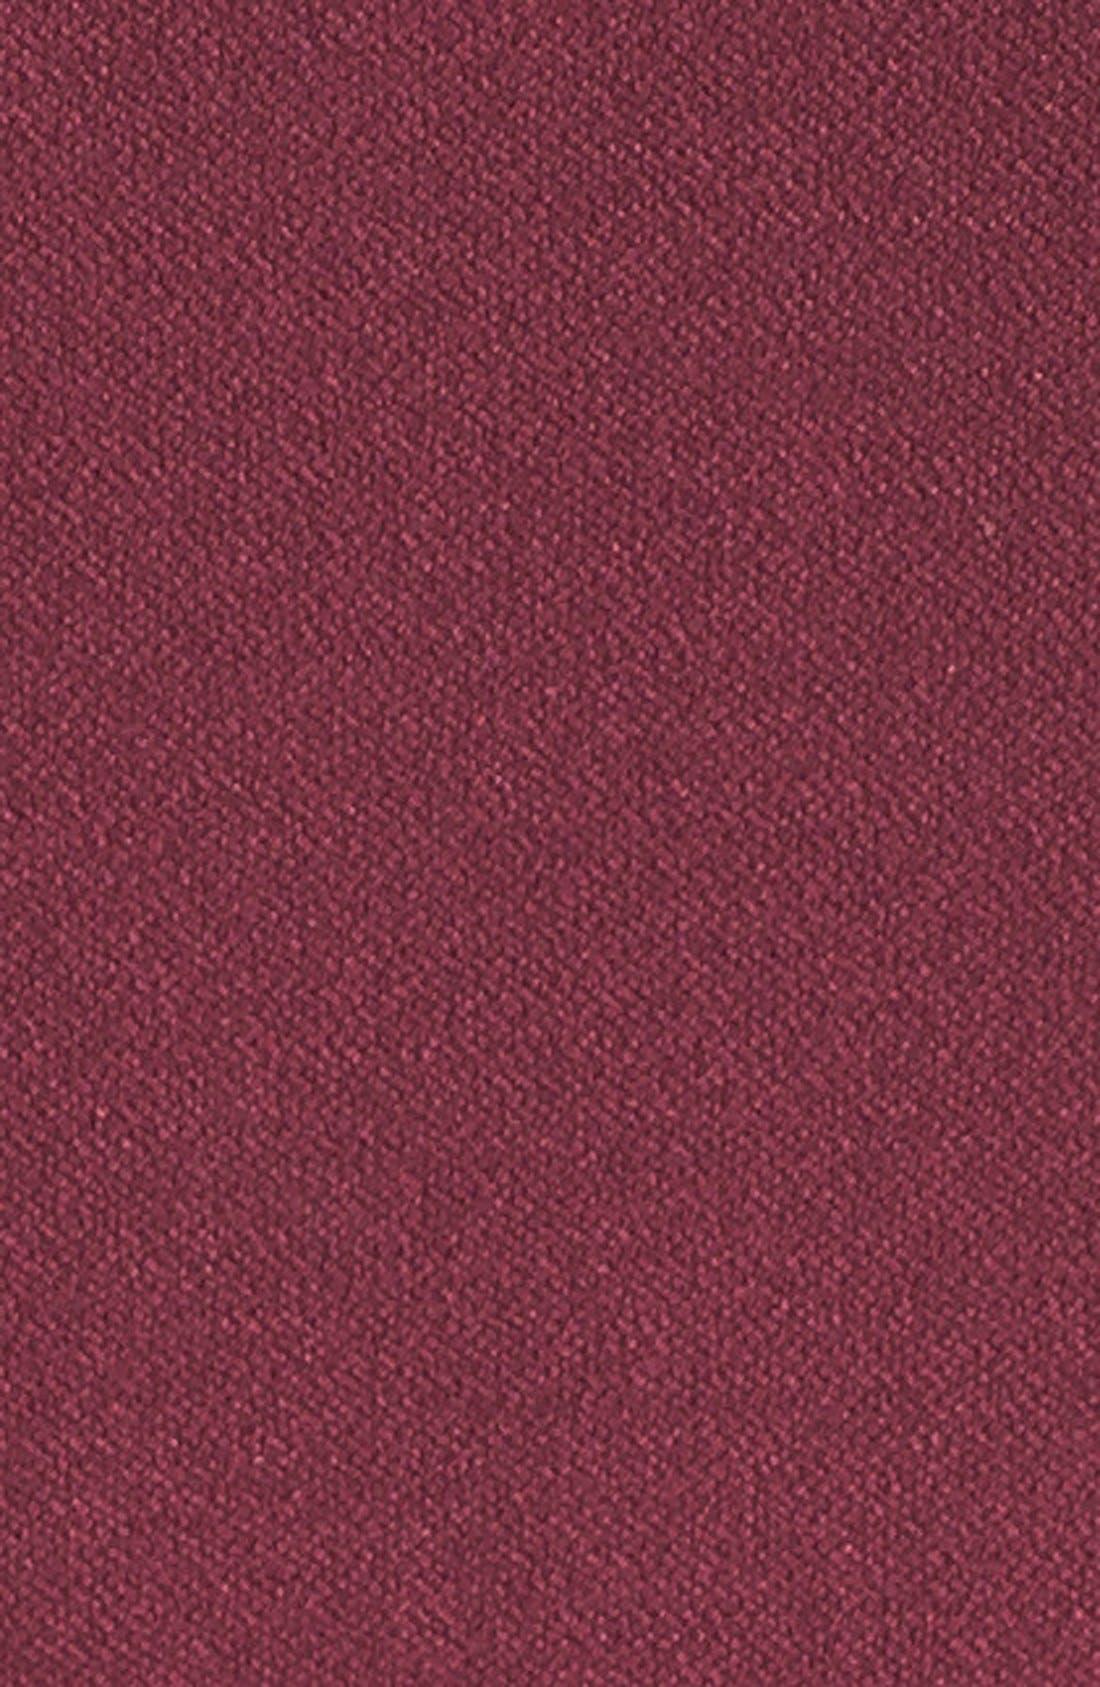 Double Crepe Belted Minidress,                             Alternate thumbnail 5, color,                             Burgundy